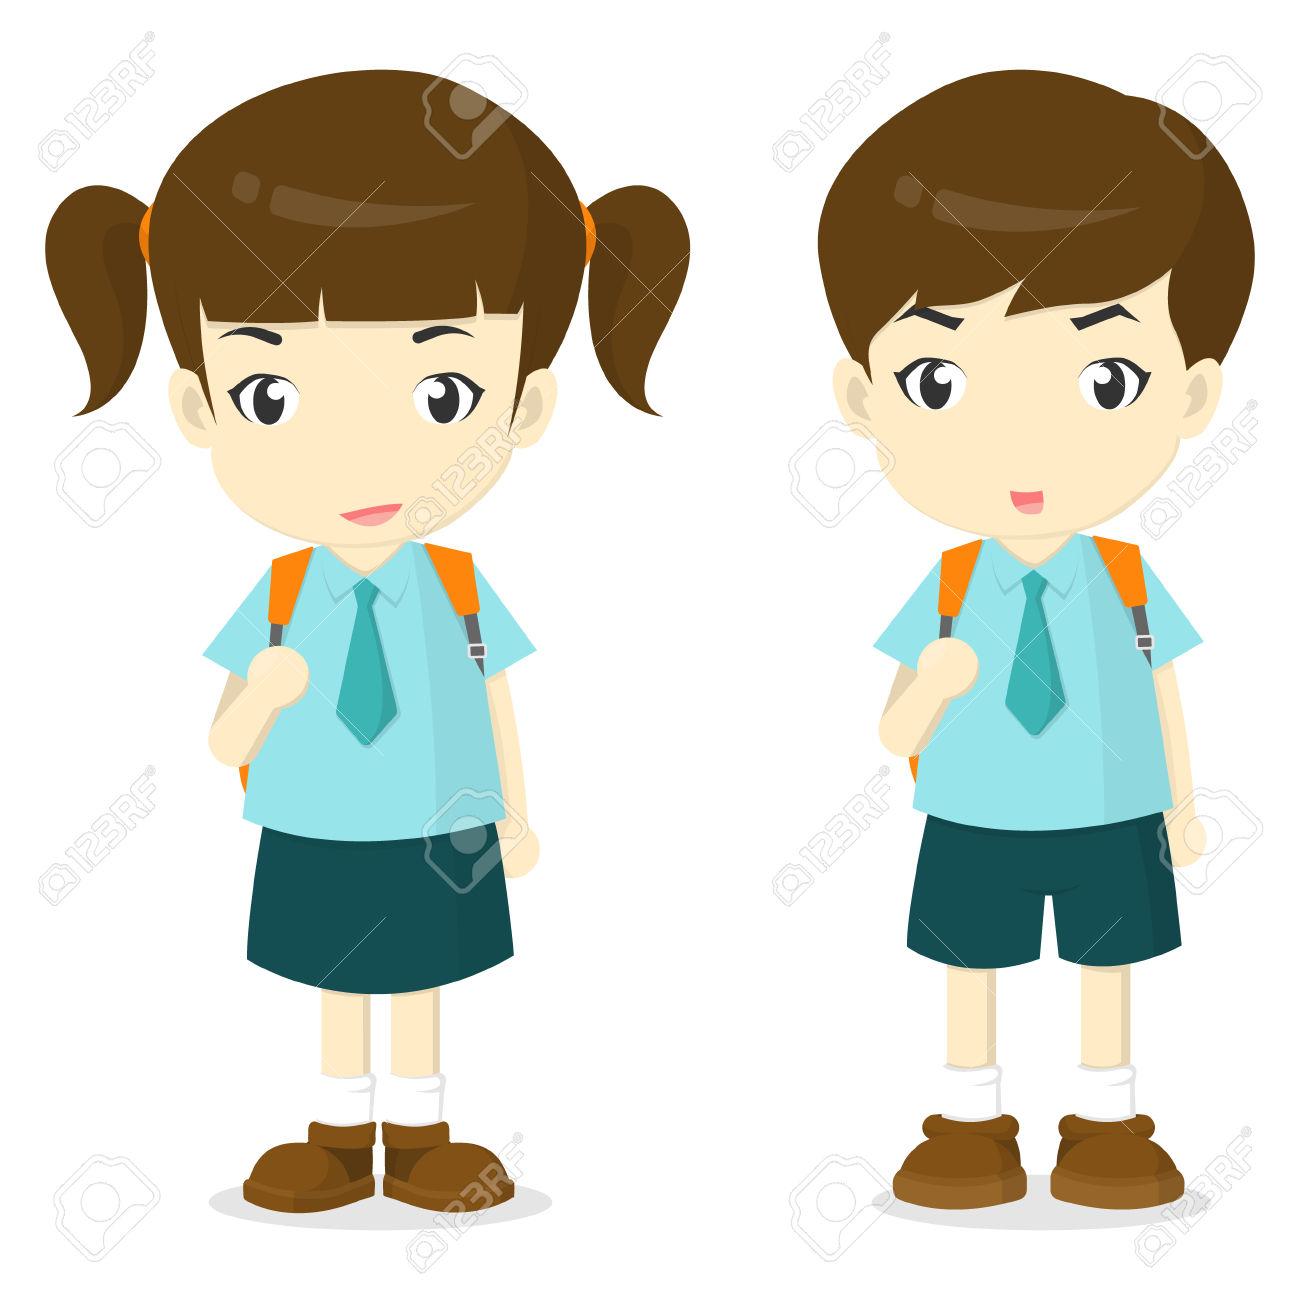 1300x1300 Uniform Clipart School Boy